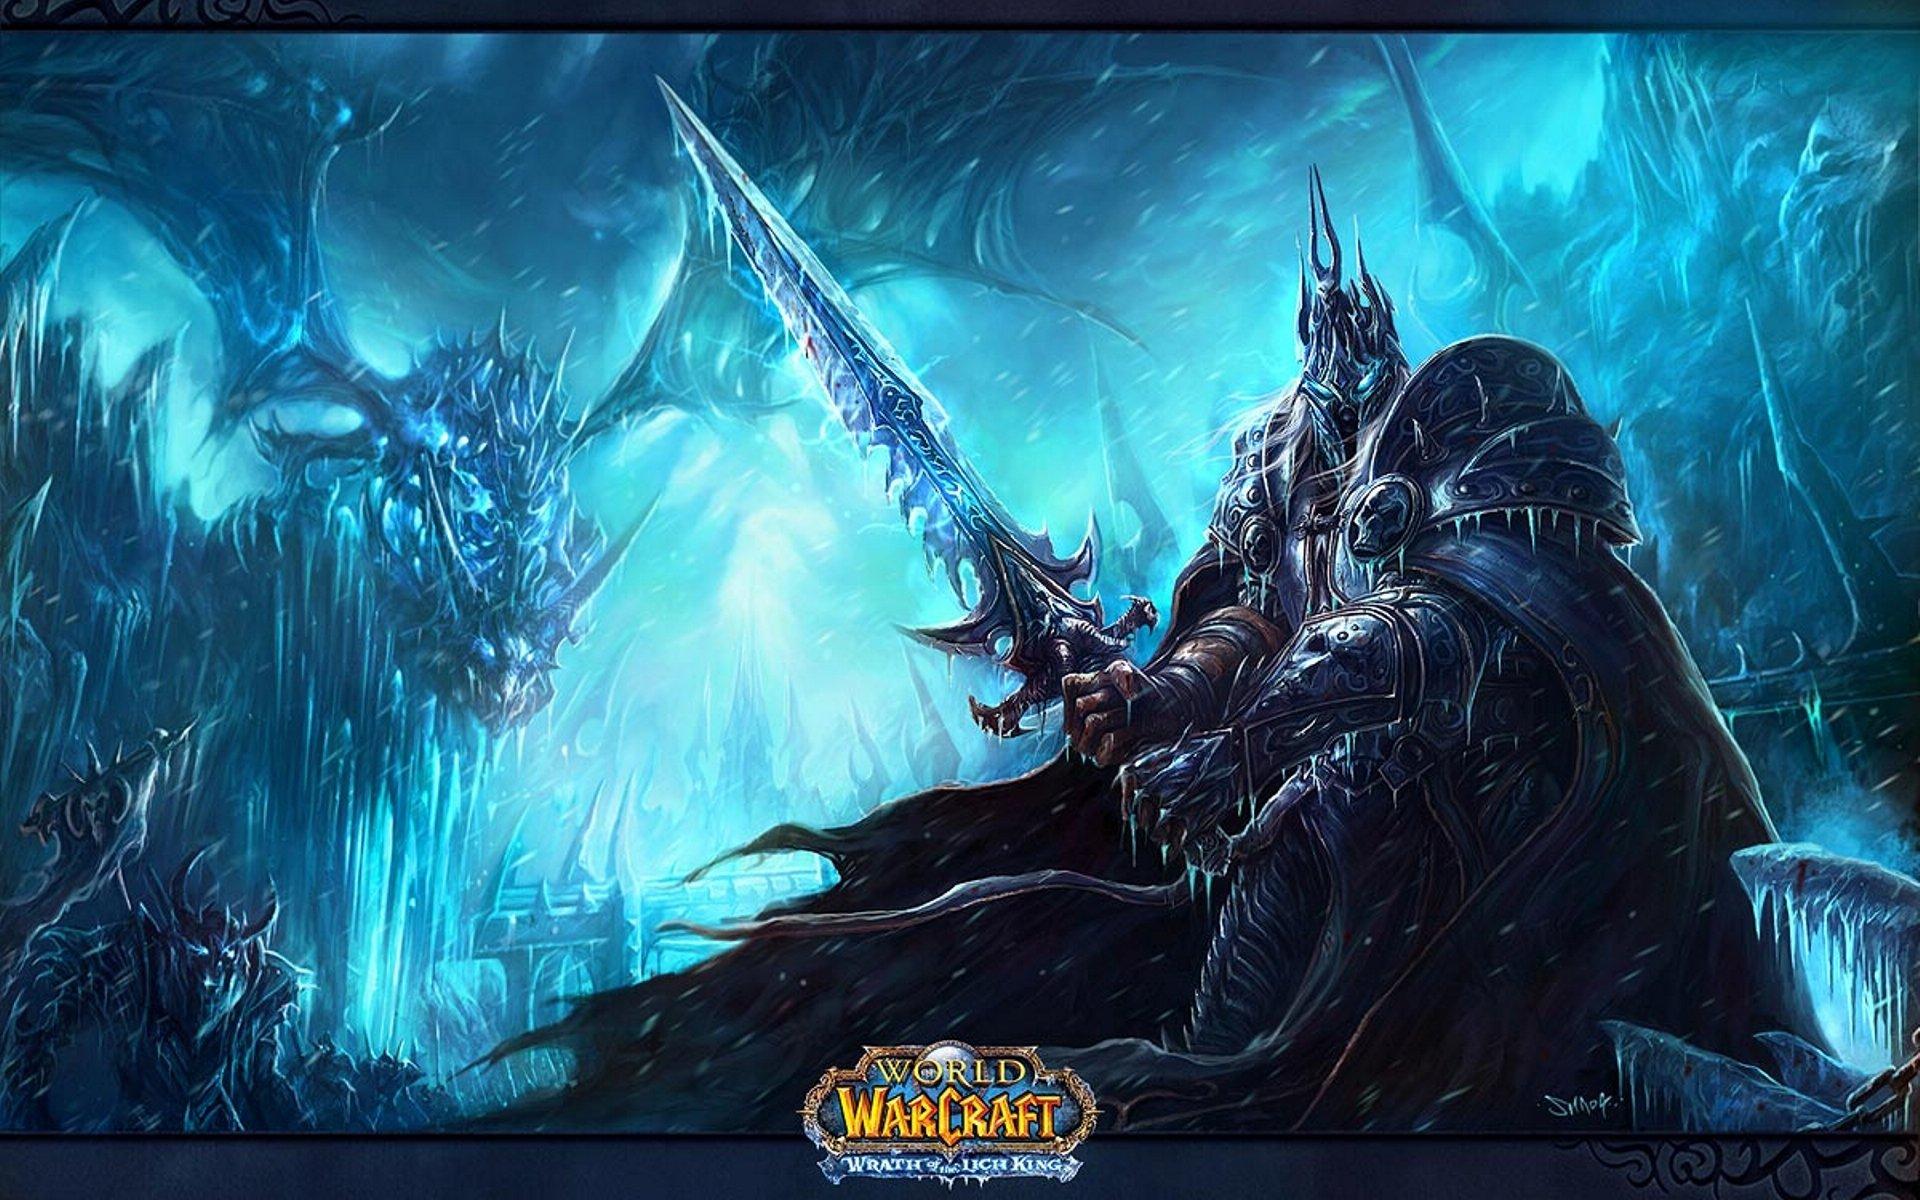 World Of Warcraft wallpaper | 1920x1200 | #68033